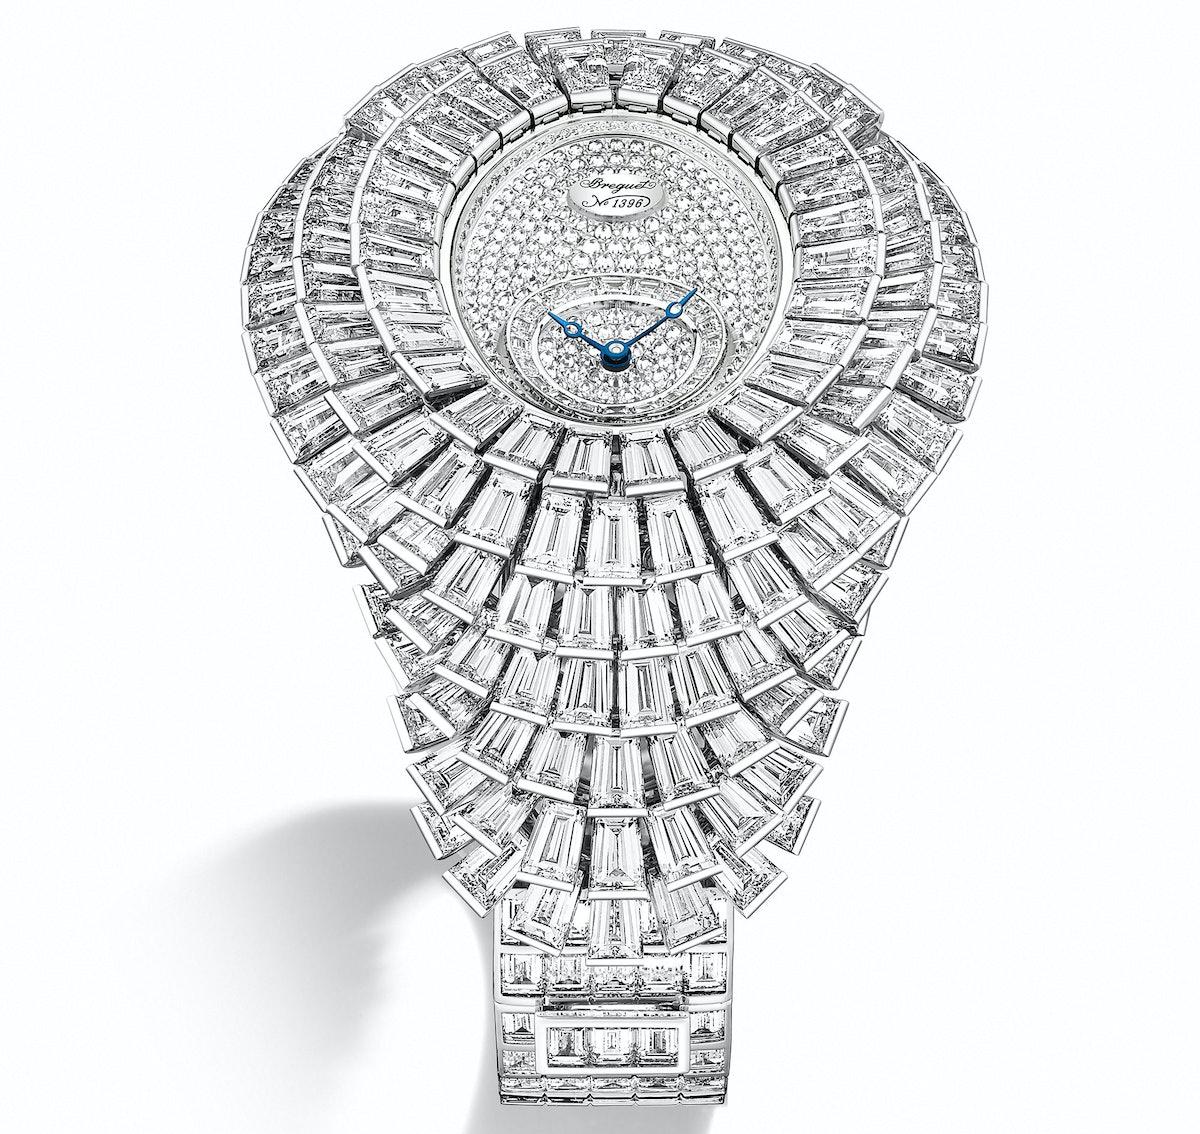 Breguet 18k white gold and diamond watch